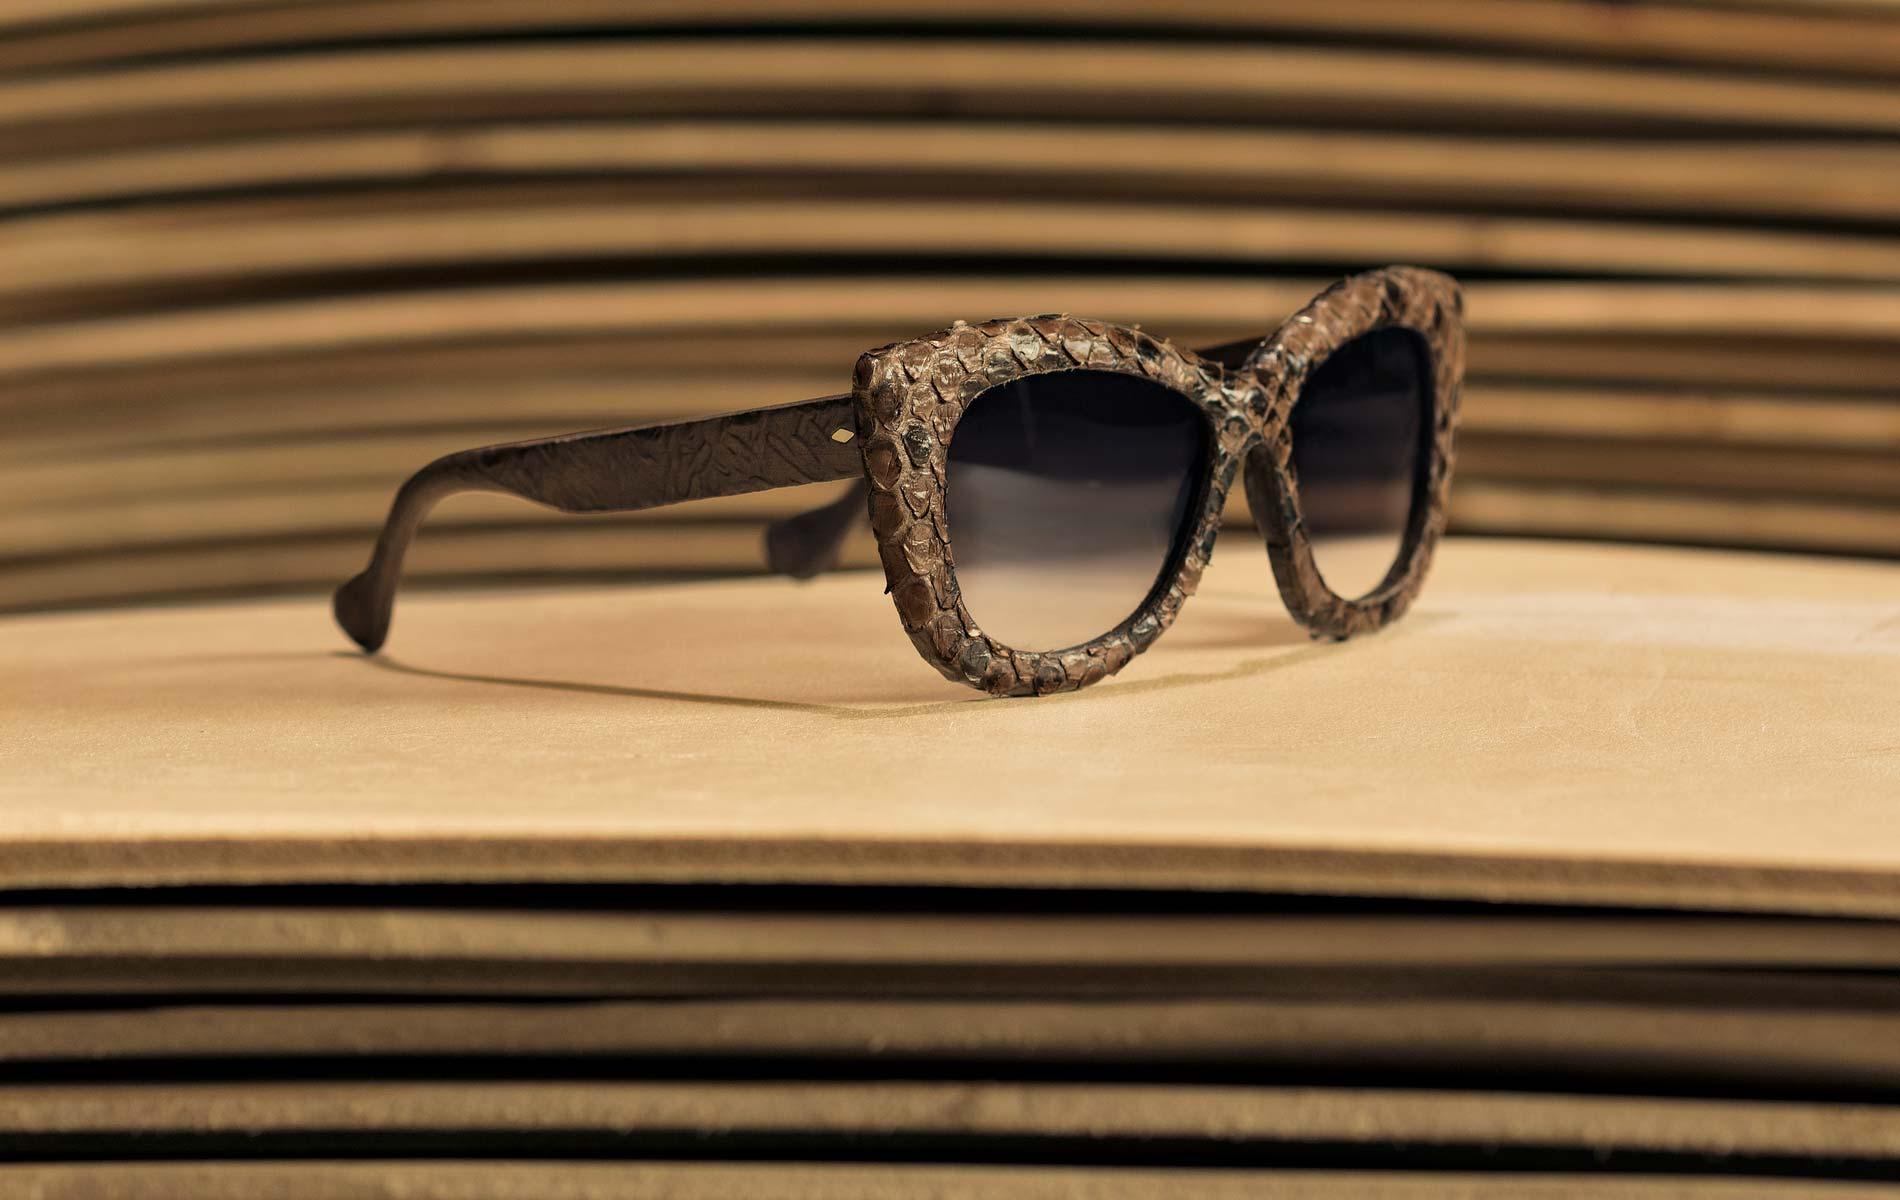 leather glasses slave to ancestors